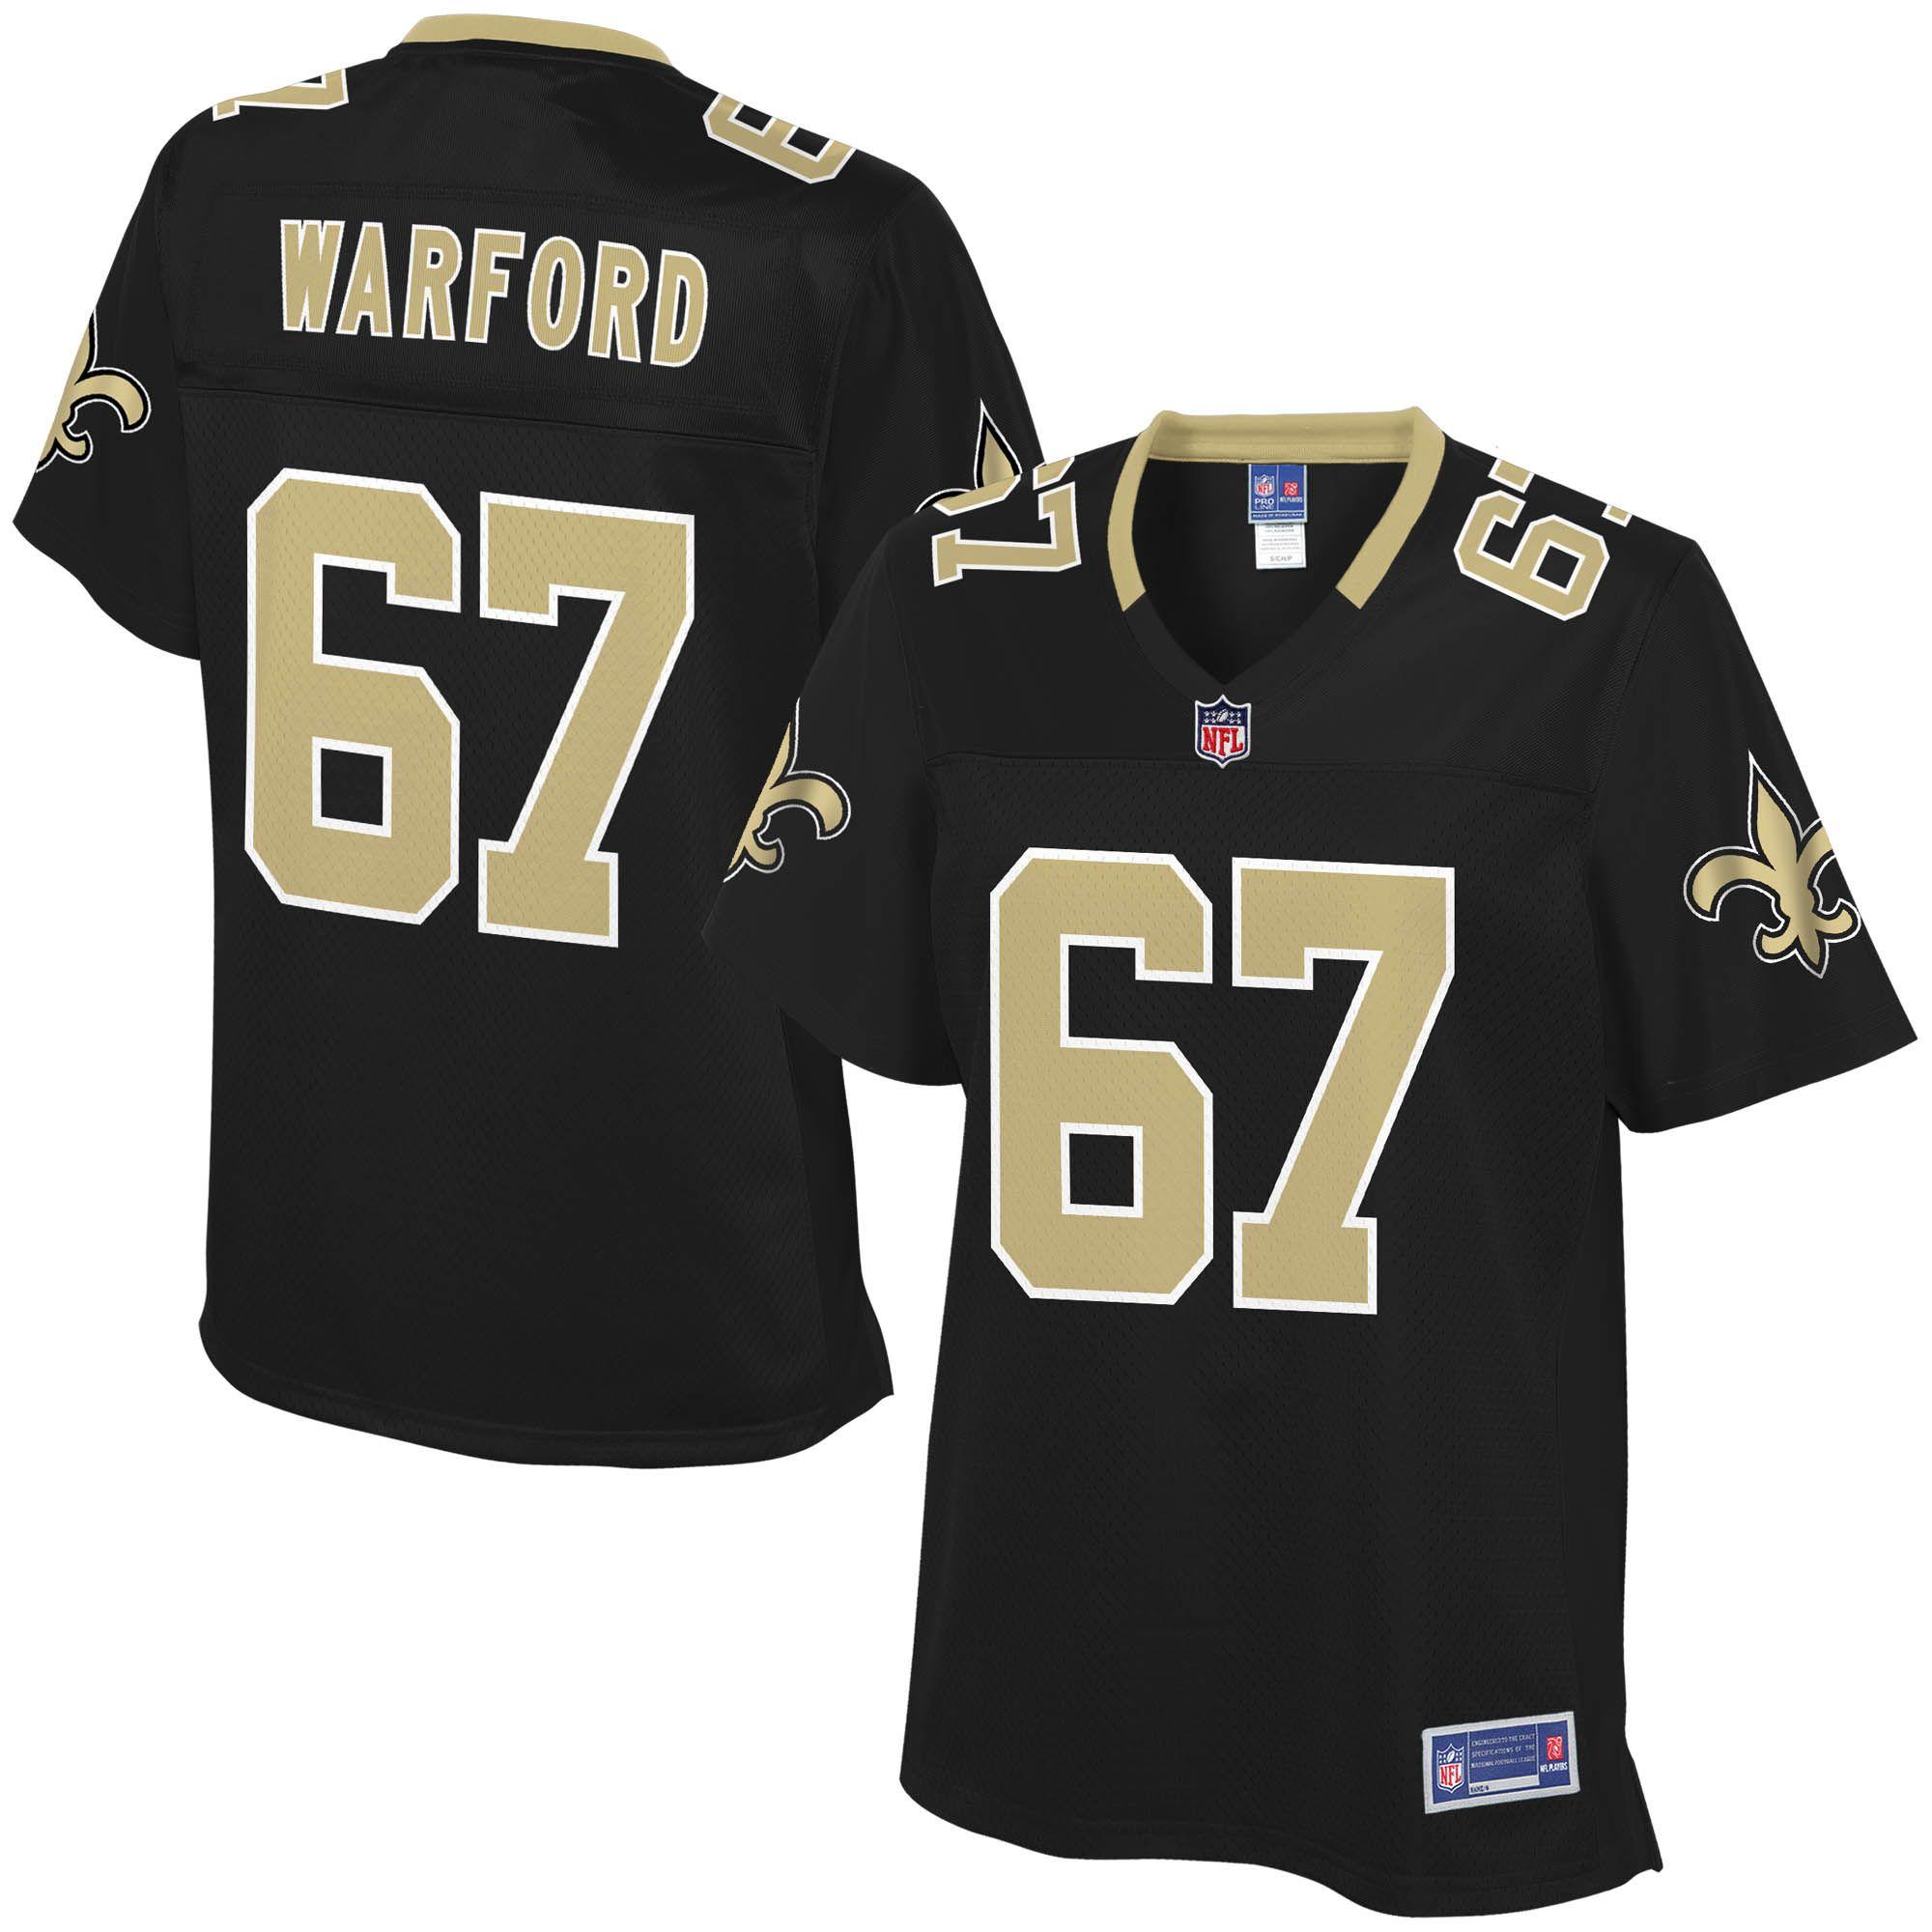 4ef9e252 Larry Warford New Orleans Saints NFL Pro Line Women's Player Jersey ...